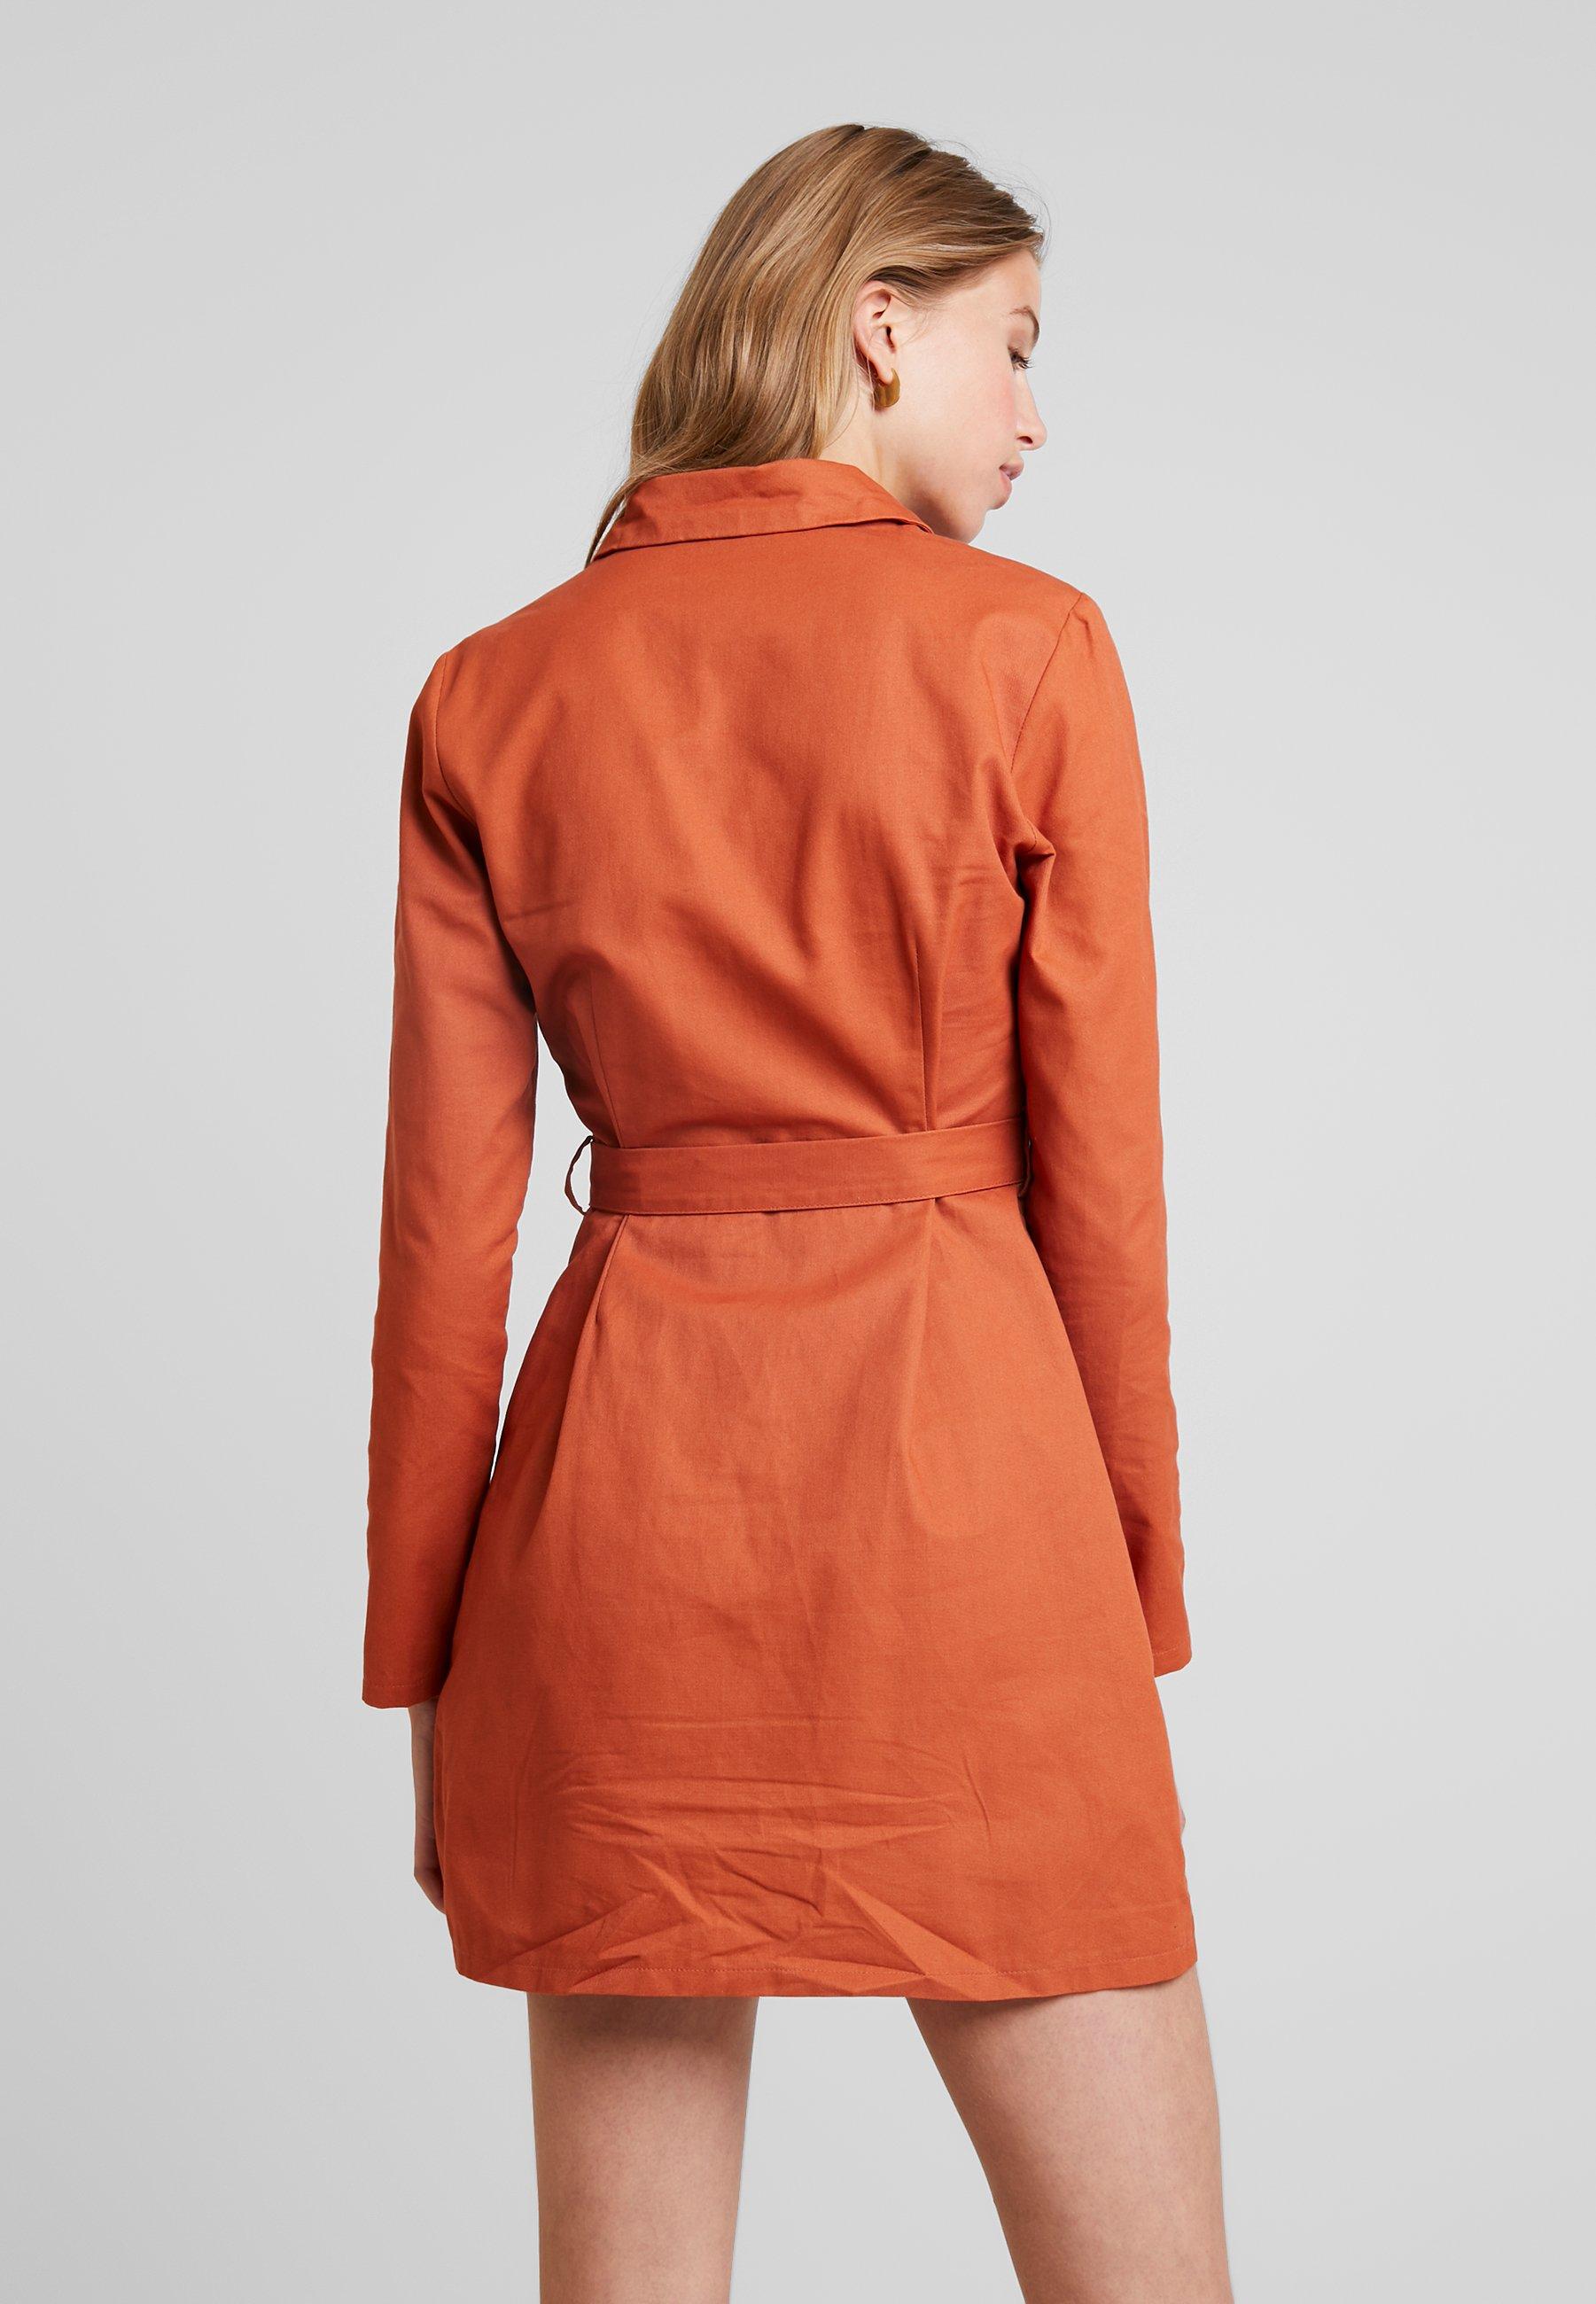 Missguided Belted Chemise Sleeve DressRobe Utility Long Rust bfyYg76v